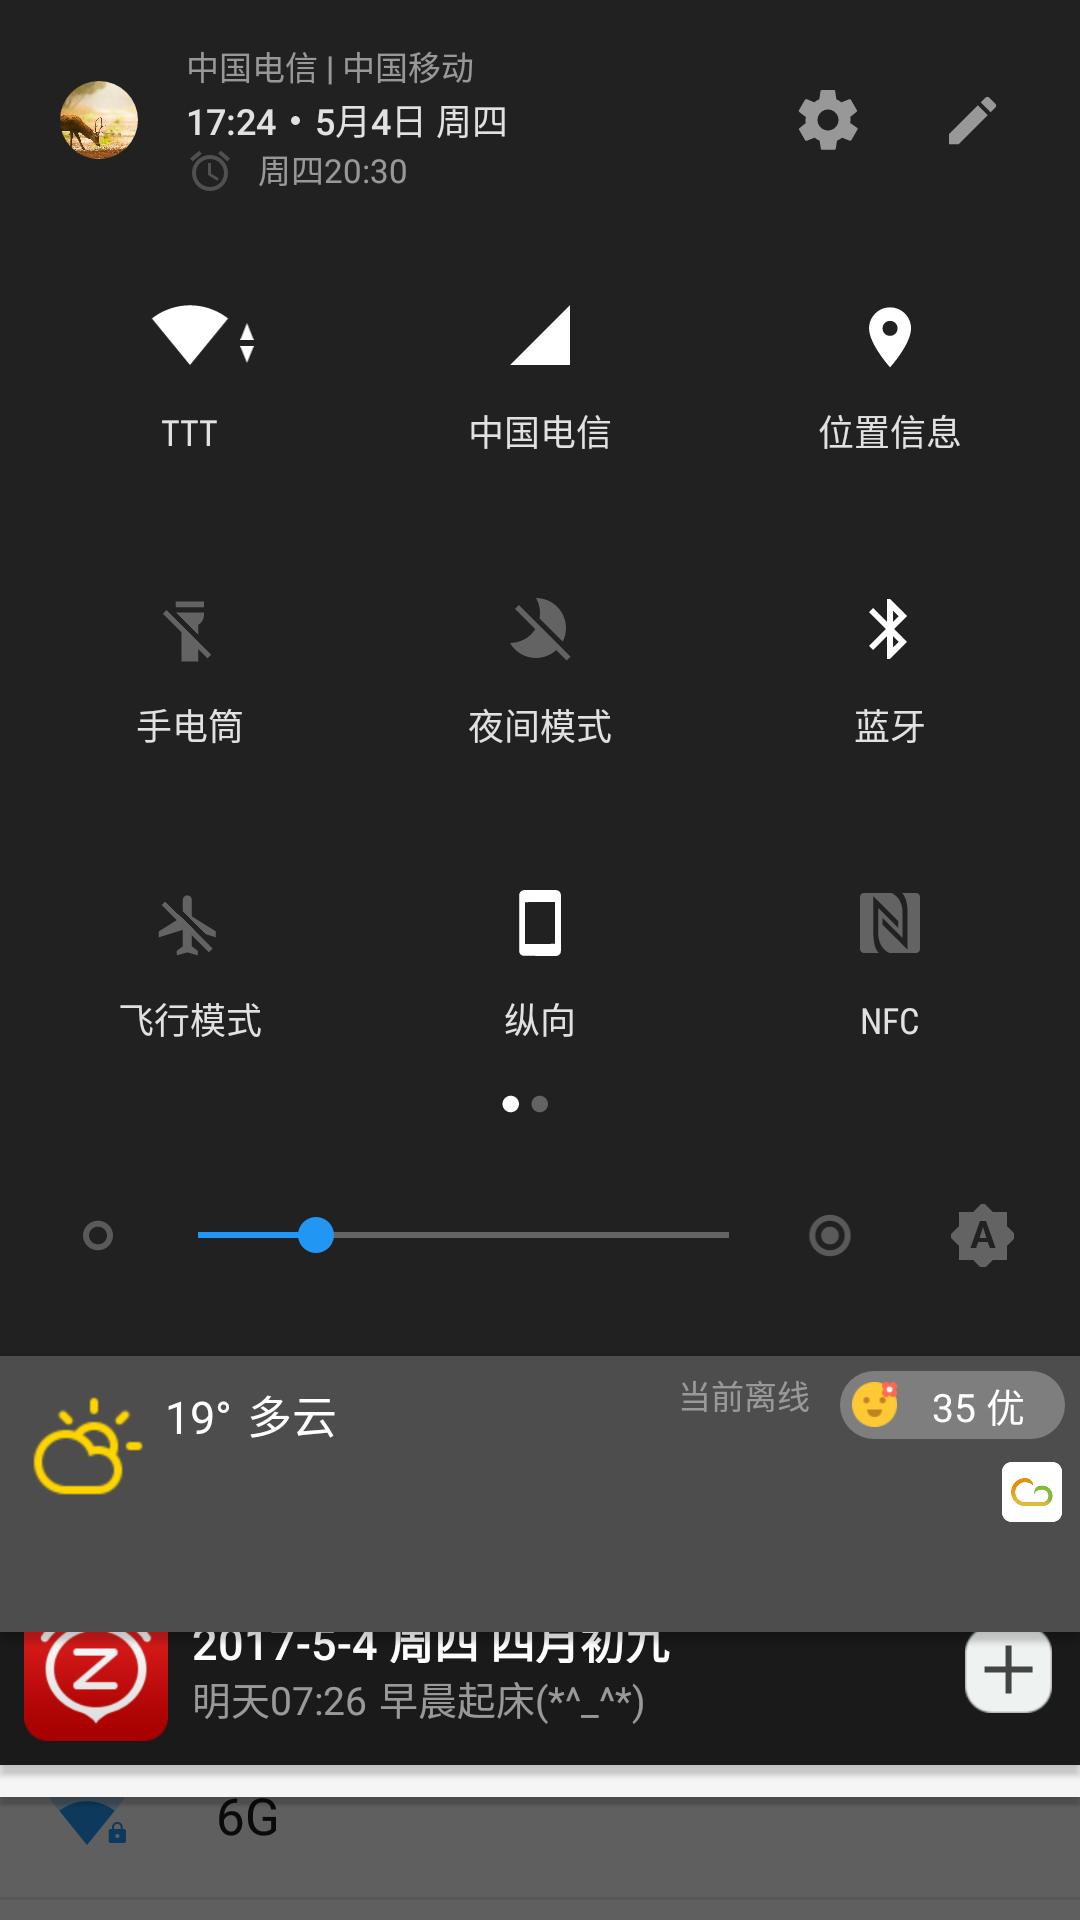 Screenshot_20170504-172401.png